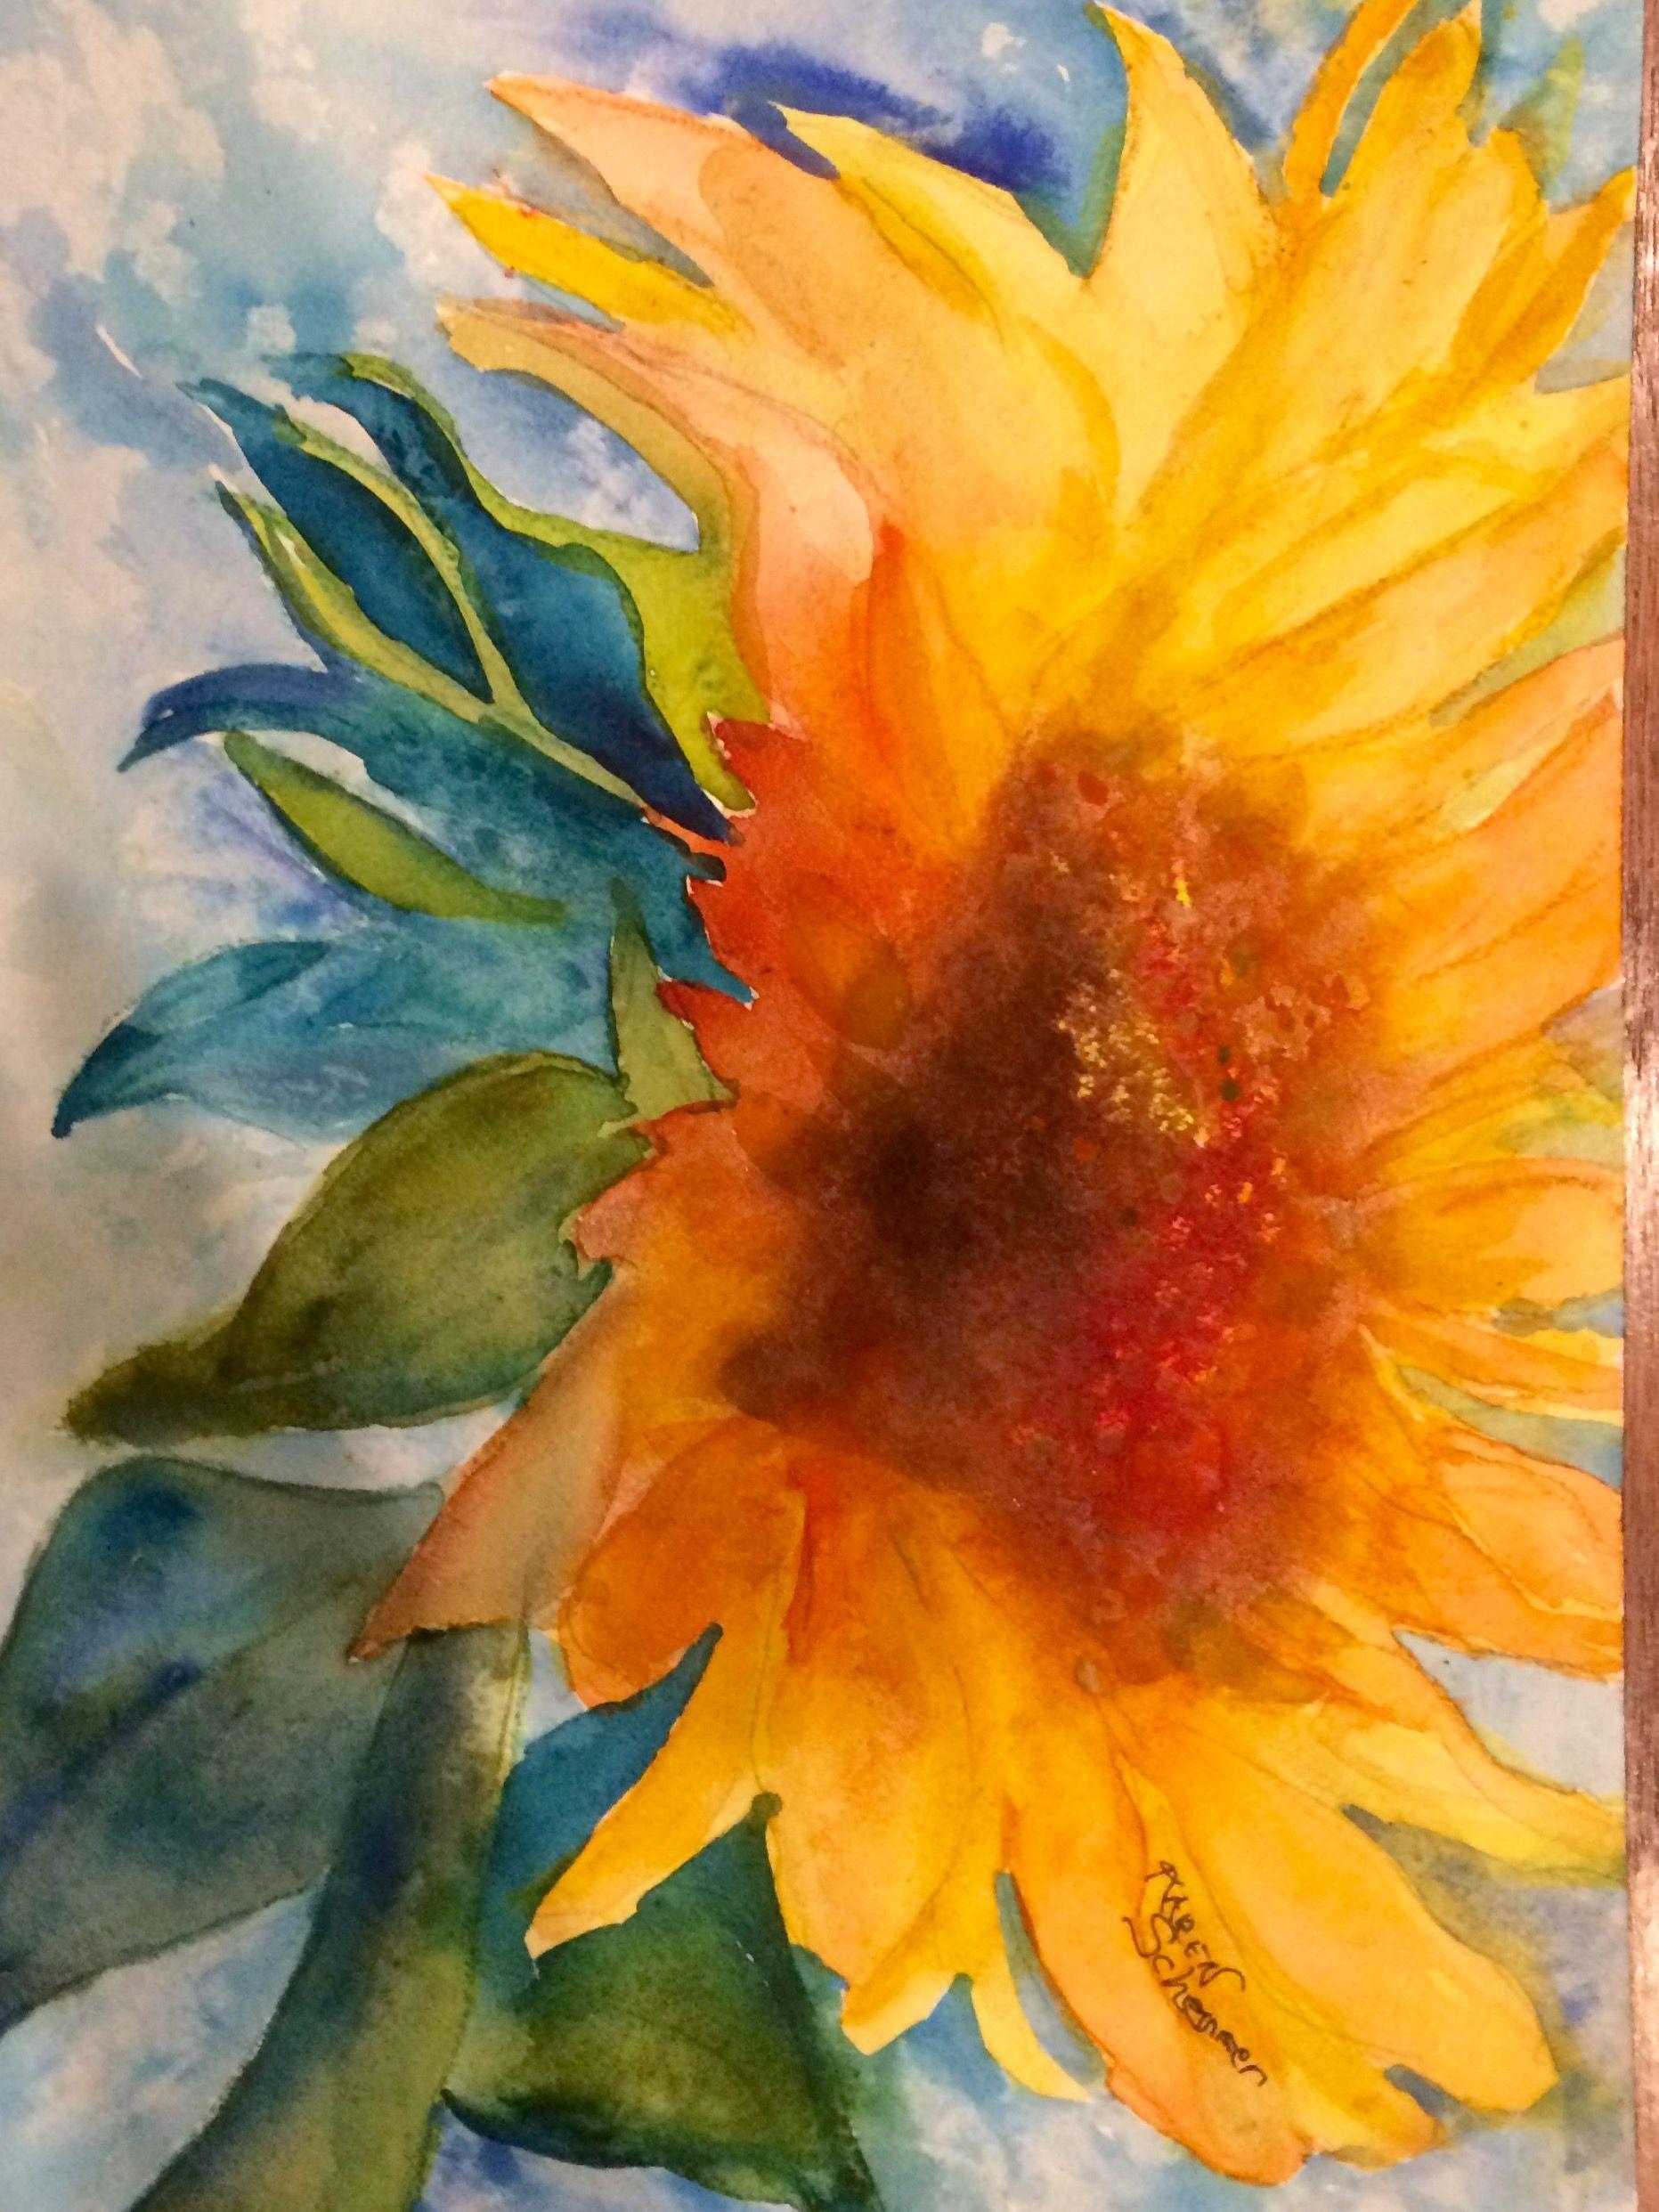 Watercolor artists in texas -  Saturday S Sunflower By Texas Watercolor Artist Karen Scherrer